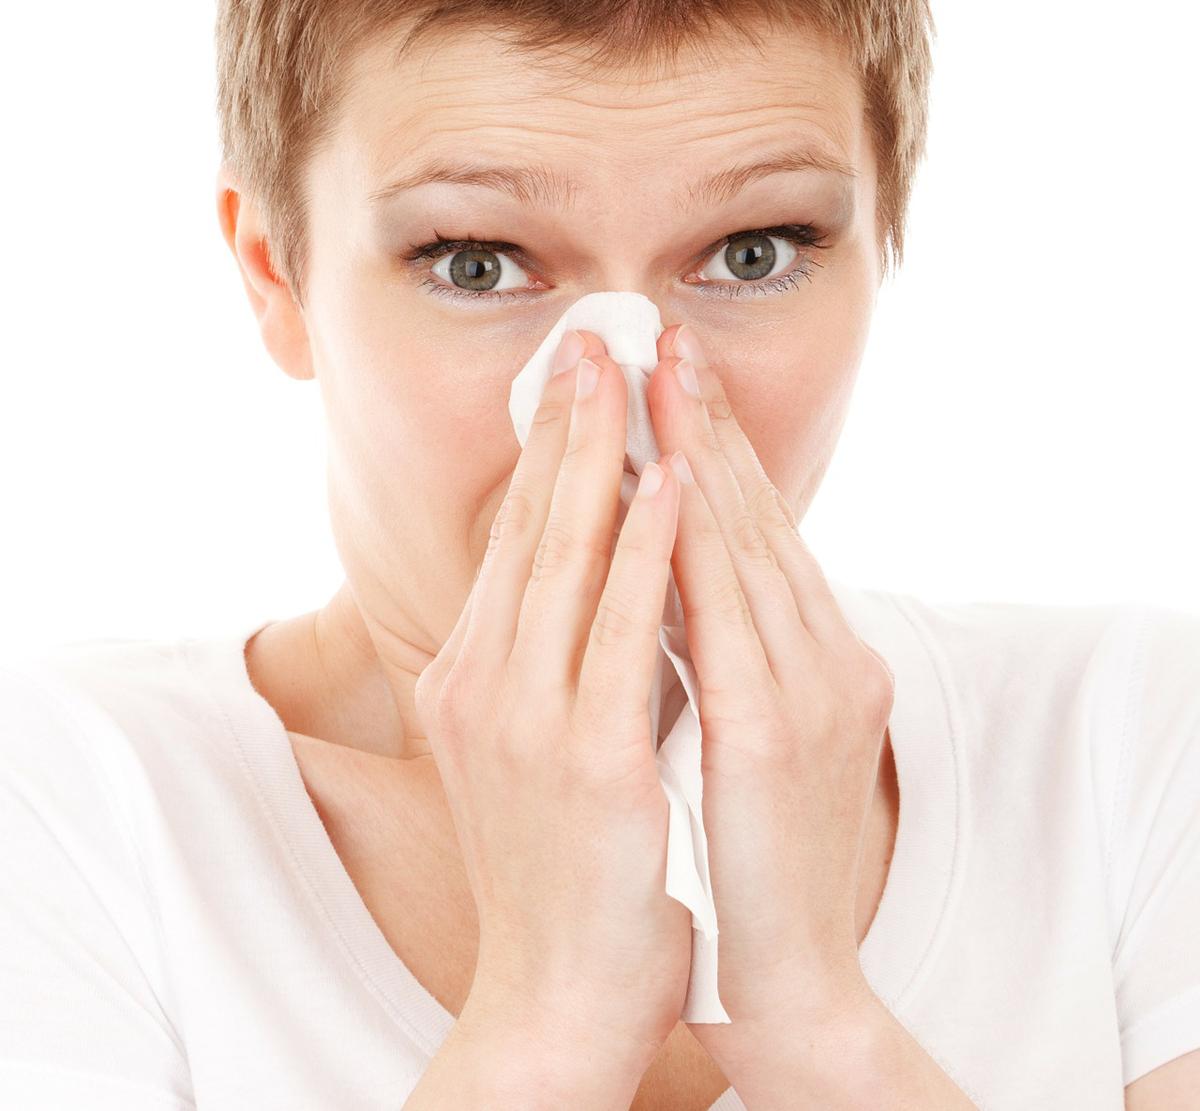 Dr. Lauren Love Denver Colorado, tips for allergies